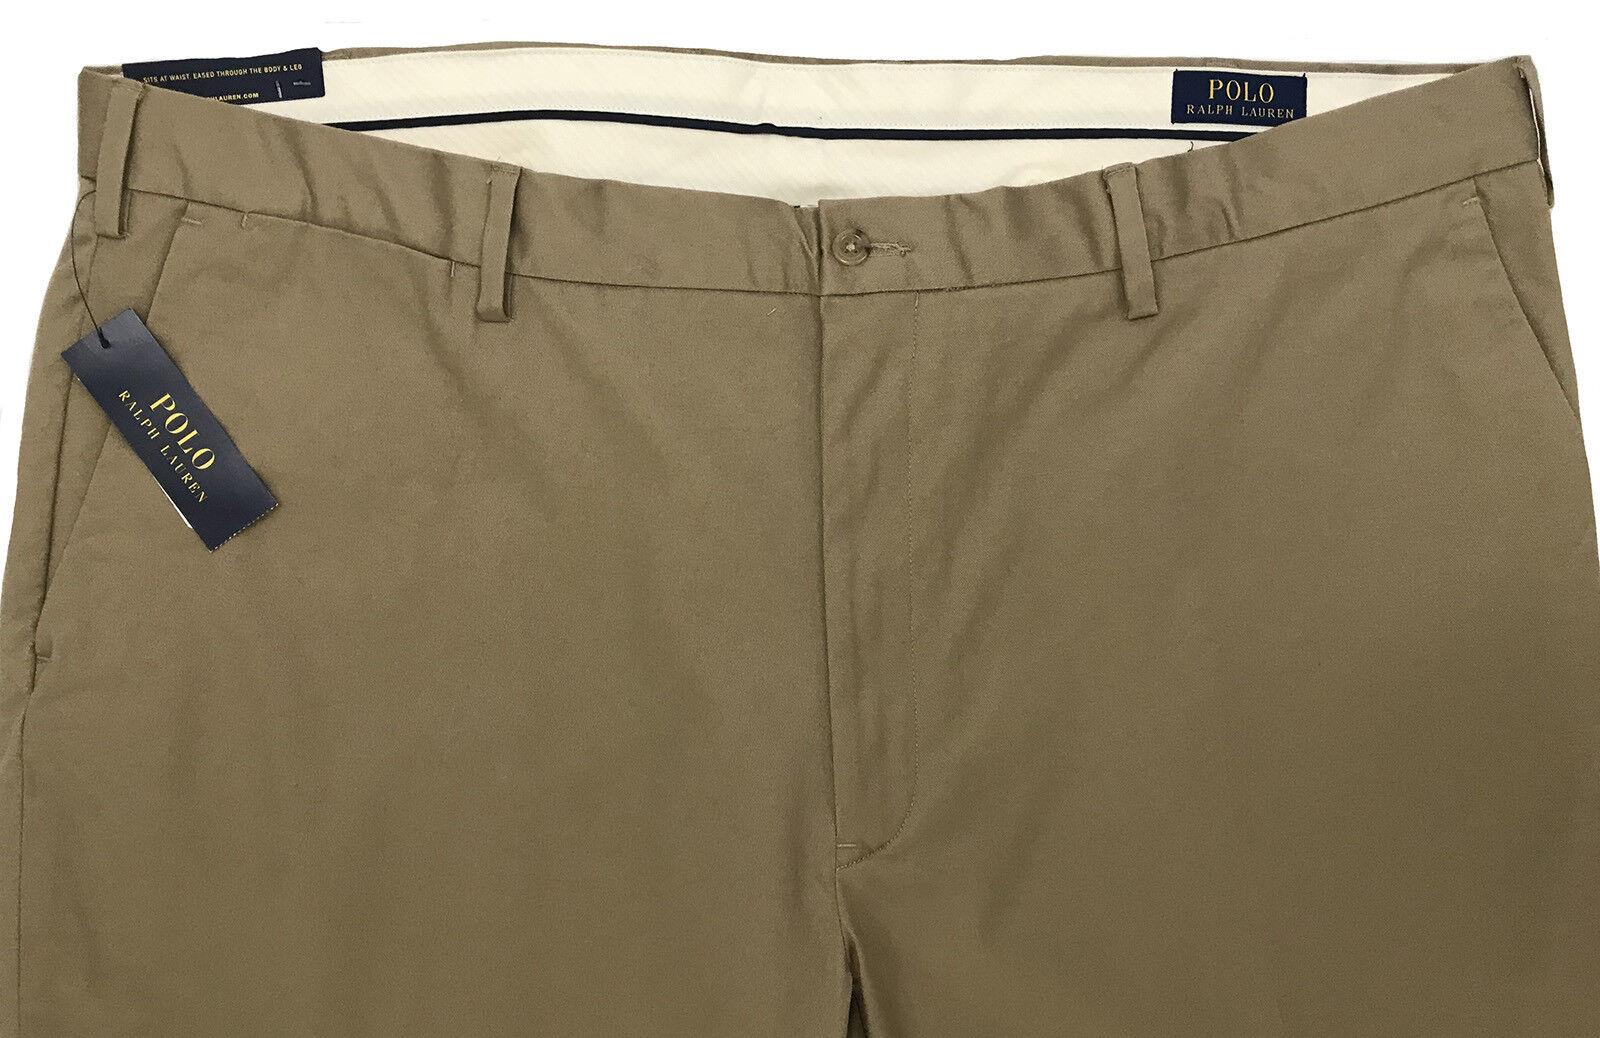 Men's POLO RALPH LAUREN Khaki Pants 46x30 46Bx30 46 NEW NWT Stretch Classic Fit